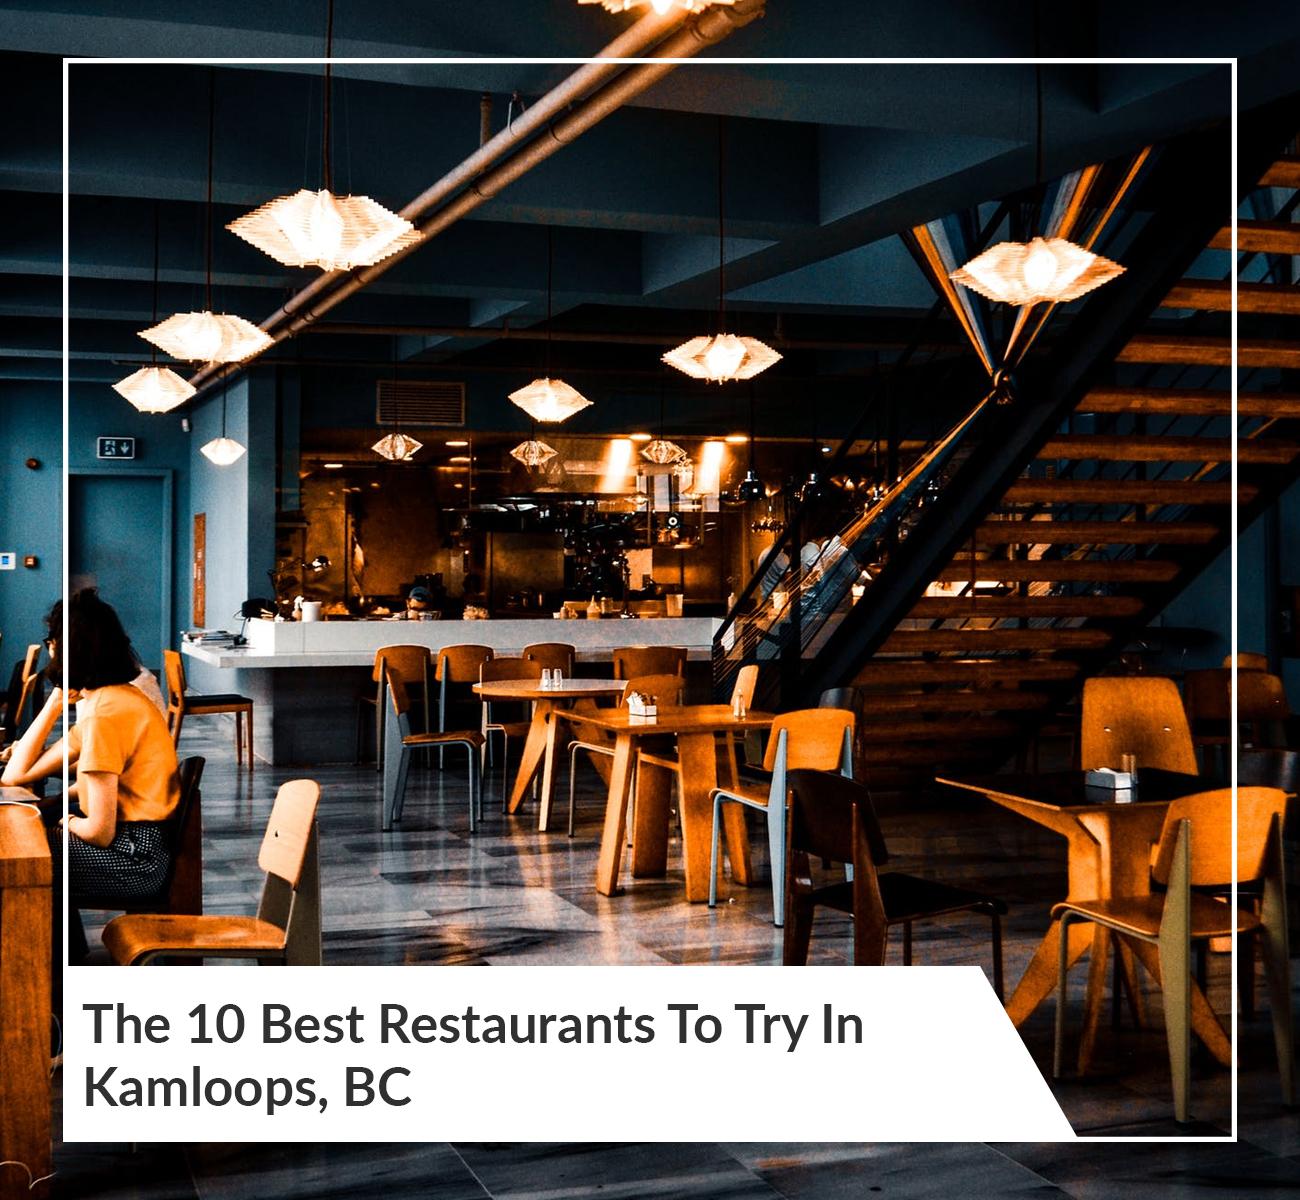 Best Restaurants in Kamloops